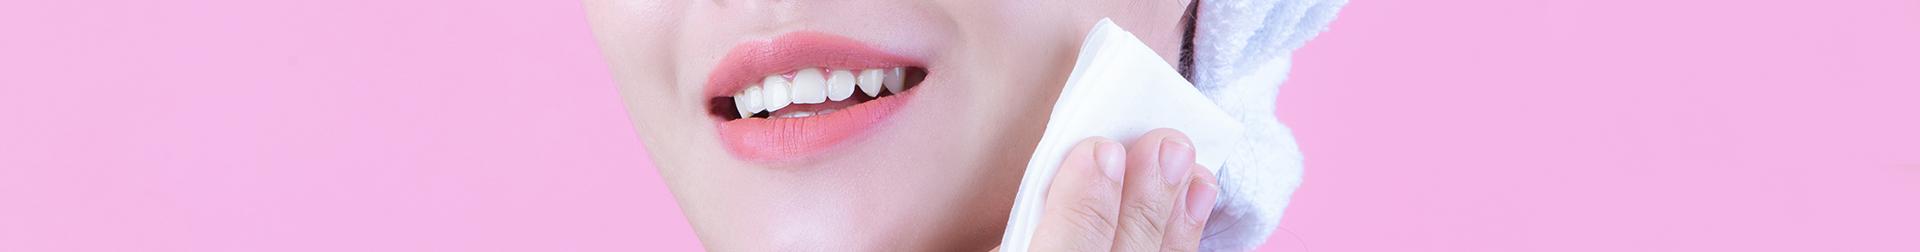 Facial Wipes | Buy Face Wipes Online | AromaCraze